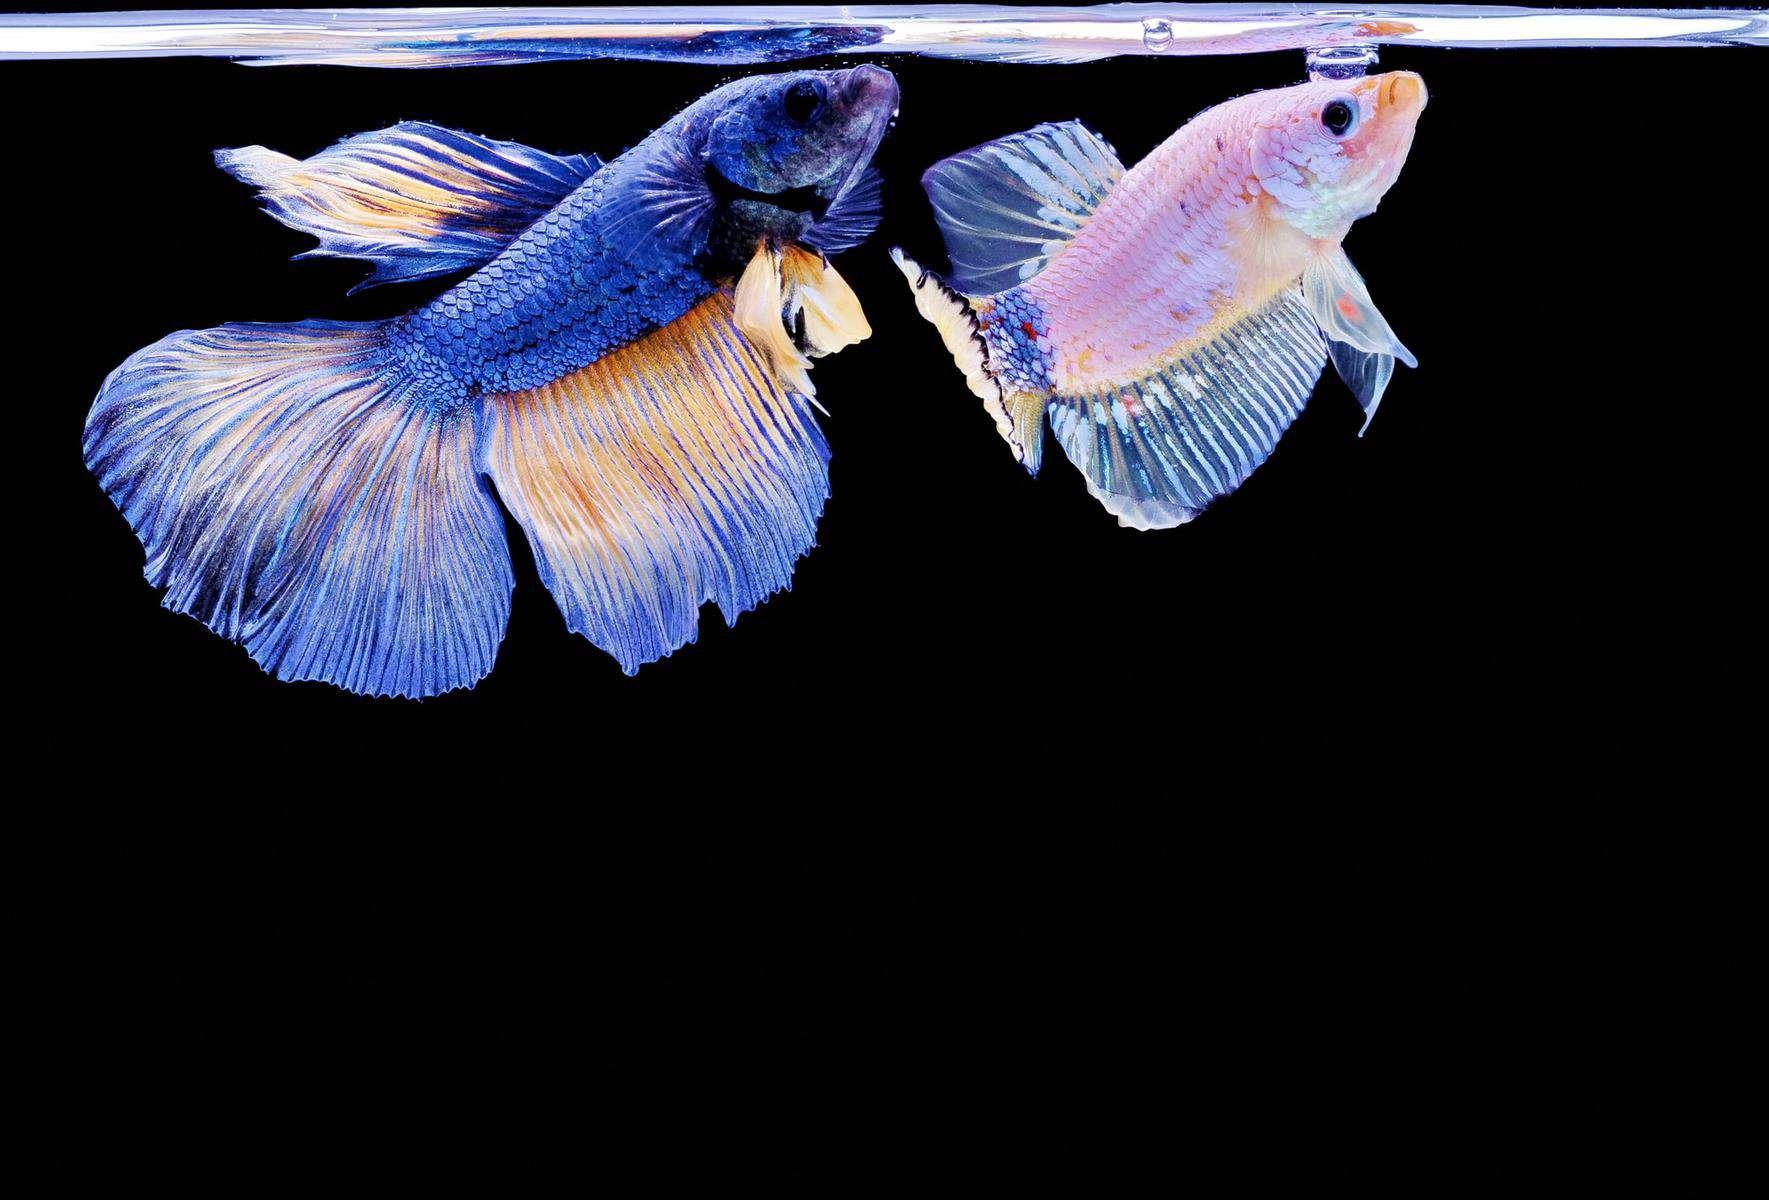 Male And Female Betta Fish Together In Aquarium